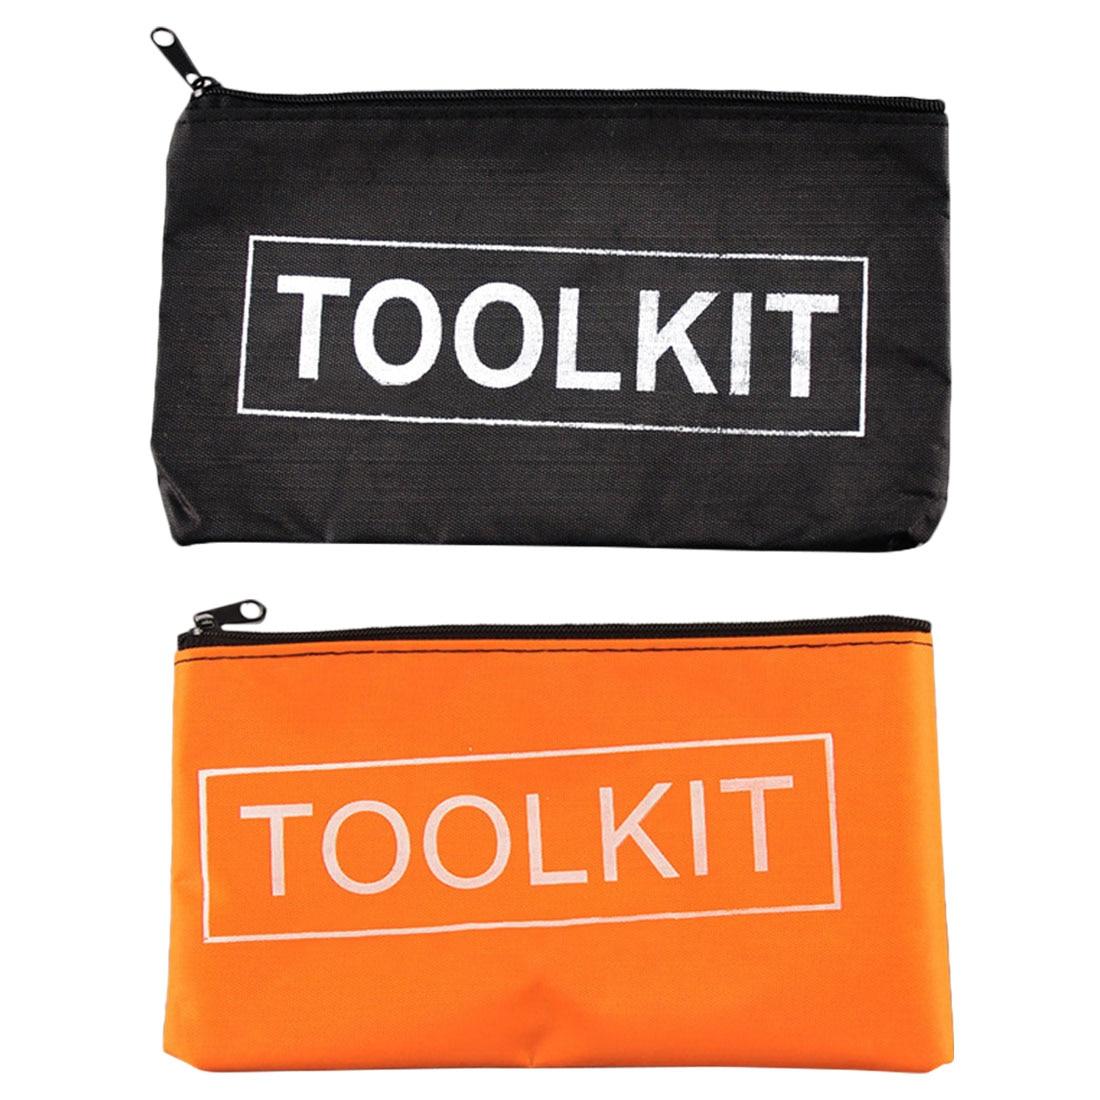 600D Oxford Cloth Tool Bag Storage Instrument Case 19x11cm Universal Size Convenient Hand Tool Bag Pocket Mini Tool Kit Bag